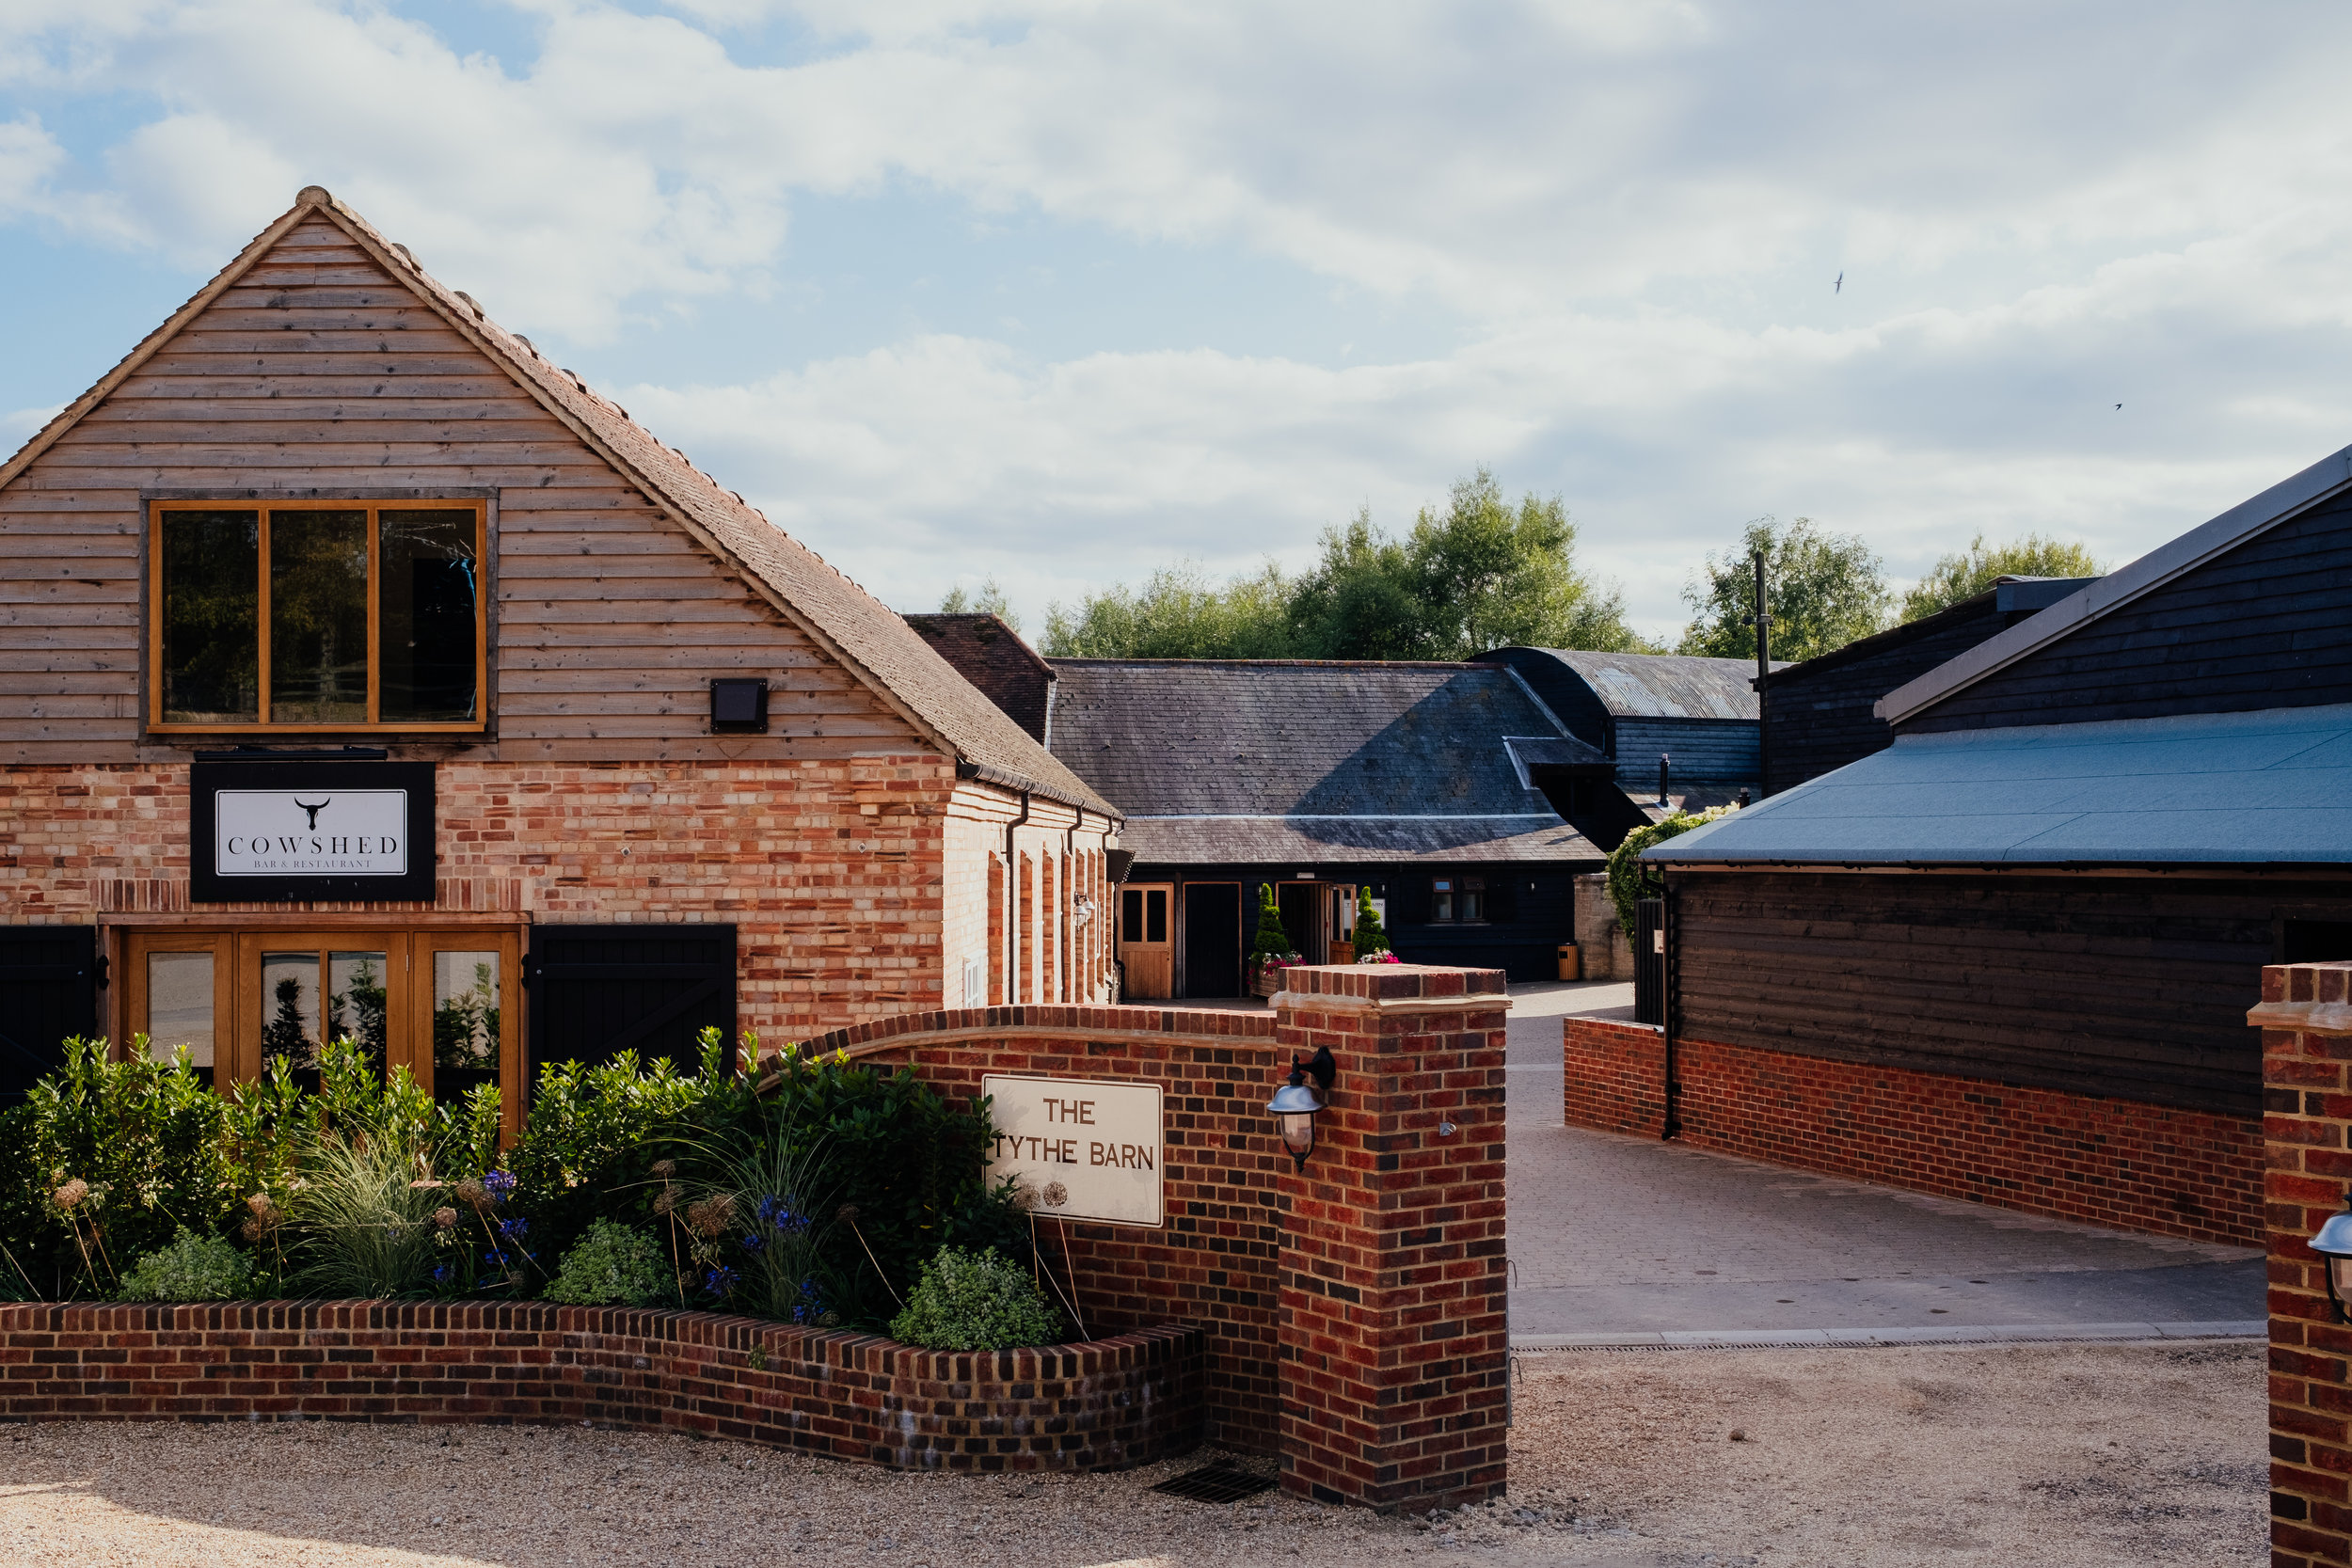 Tewin Bury Farm The Tythe Barn wedding